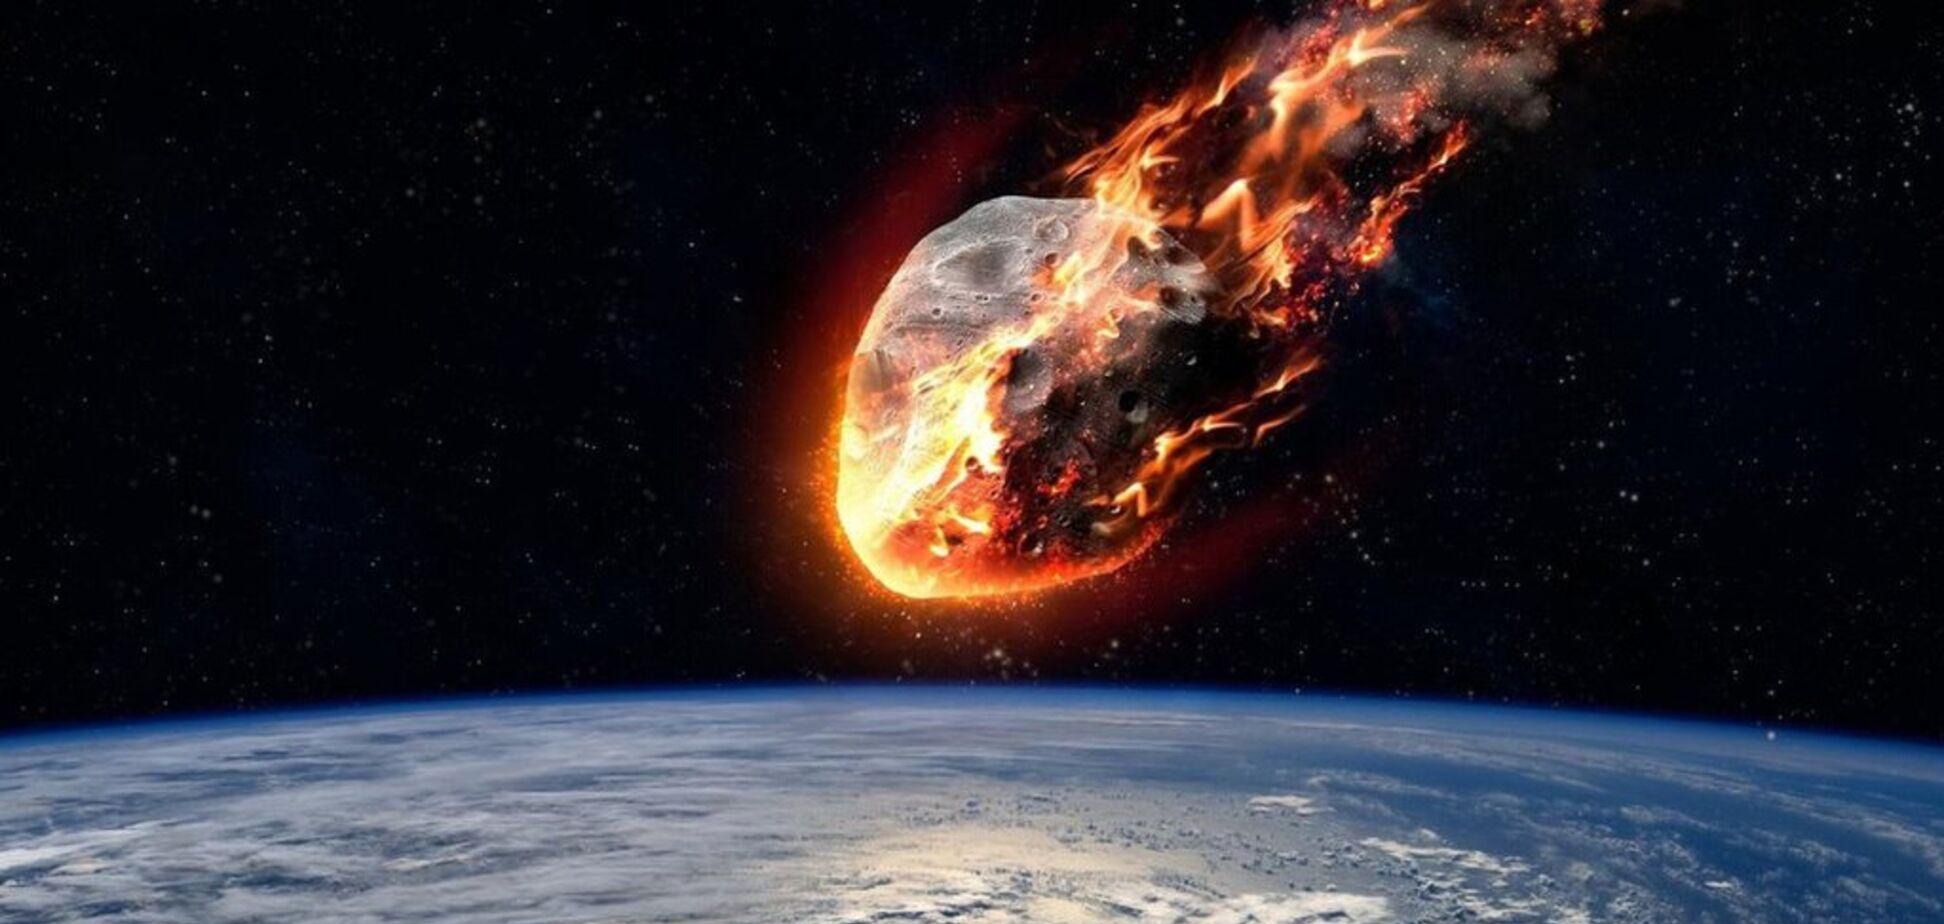 До Землі мчить величезний астероїд: в NASA назвали дату